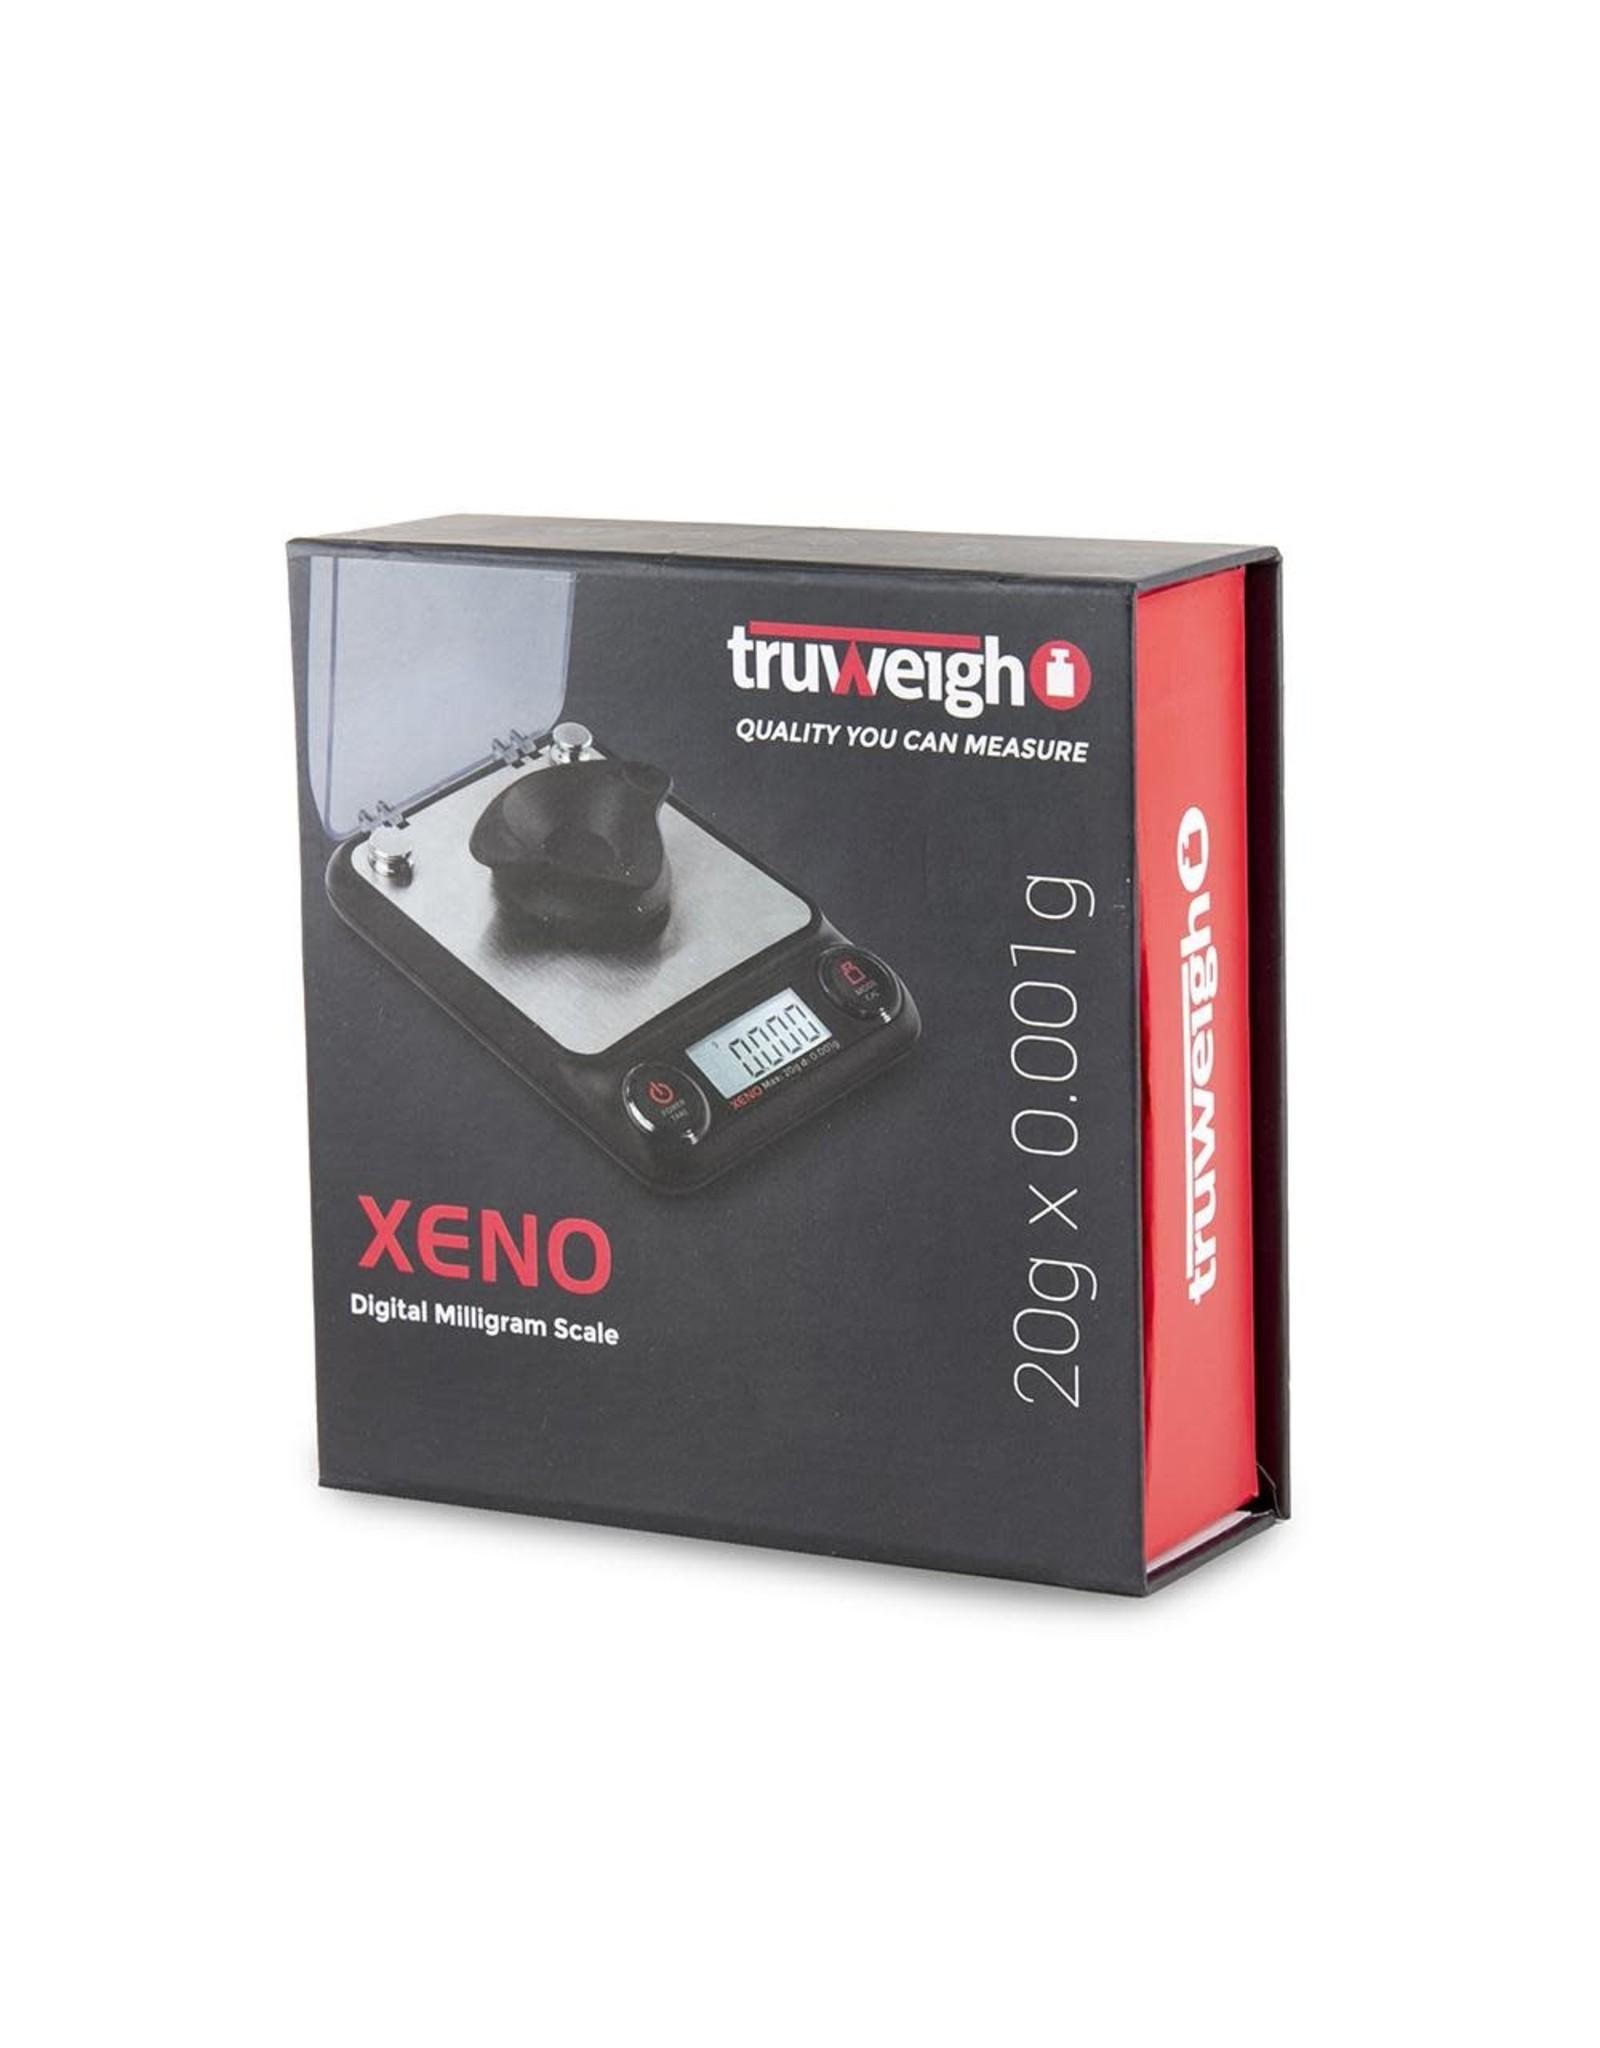 truweigh Truweight Xeno milligram scale 20gx .001g